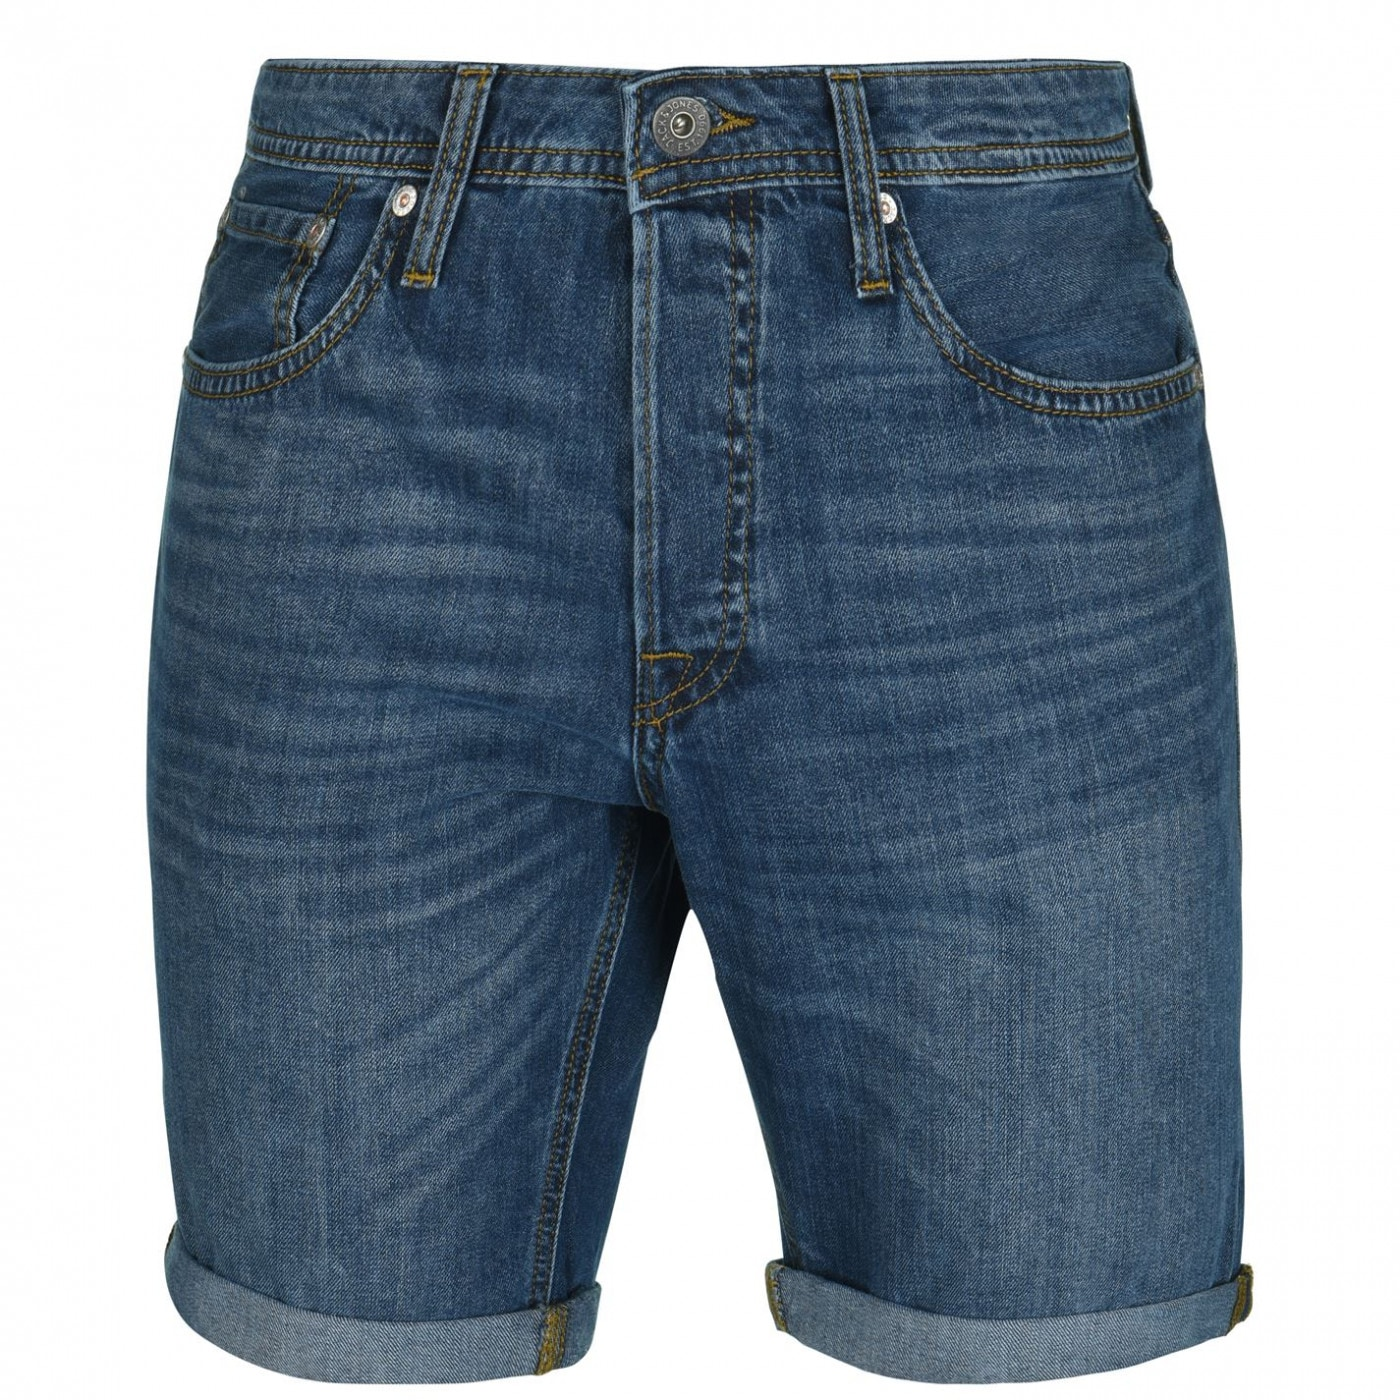 Jack and Jones Rick Denim Shorts Mens